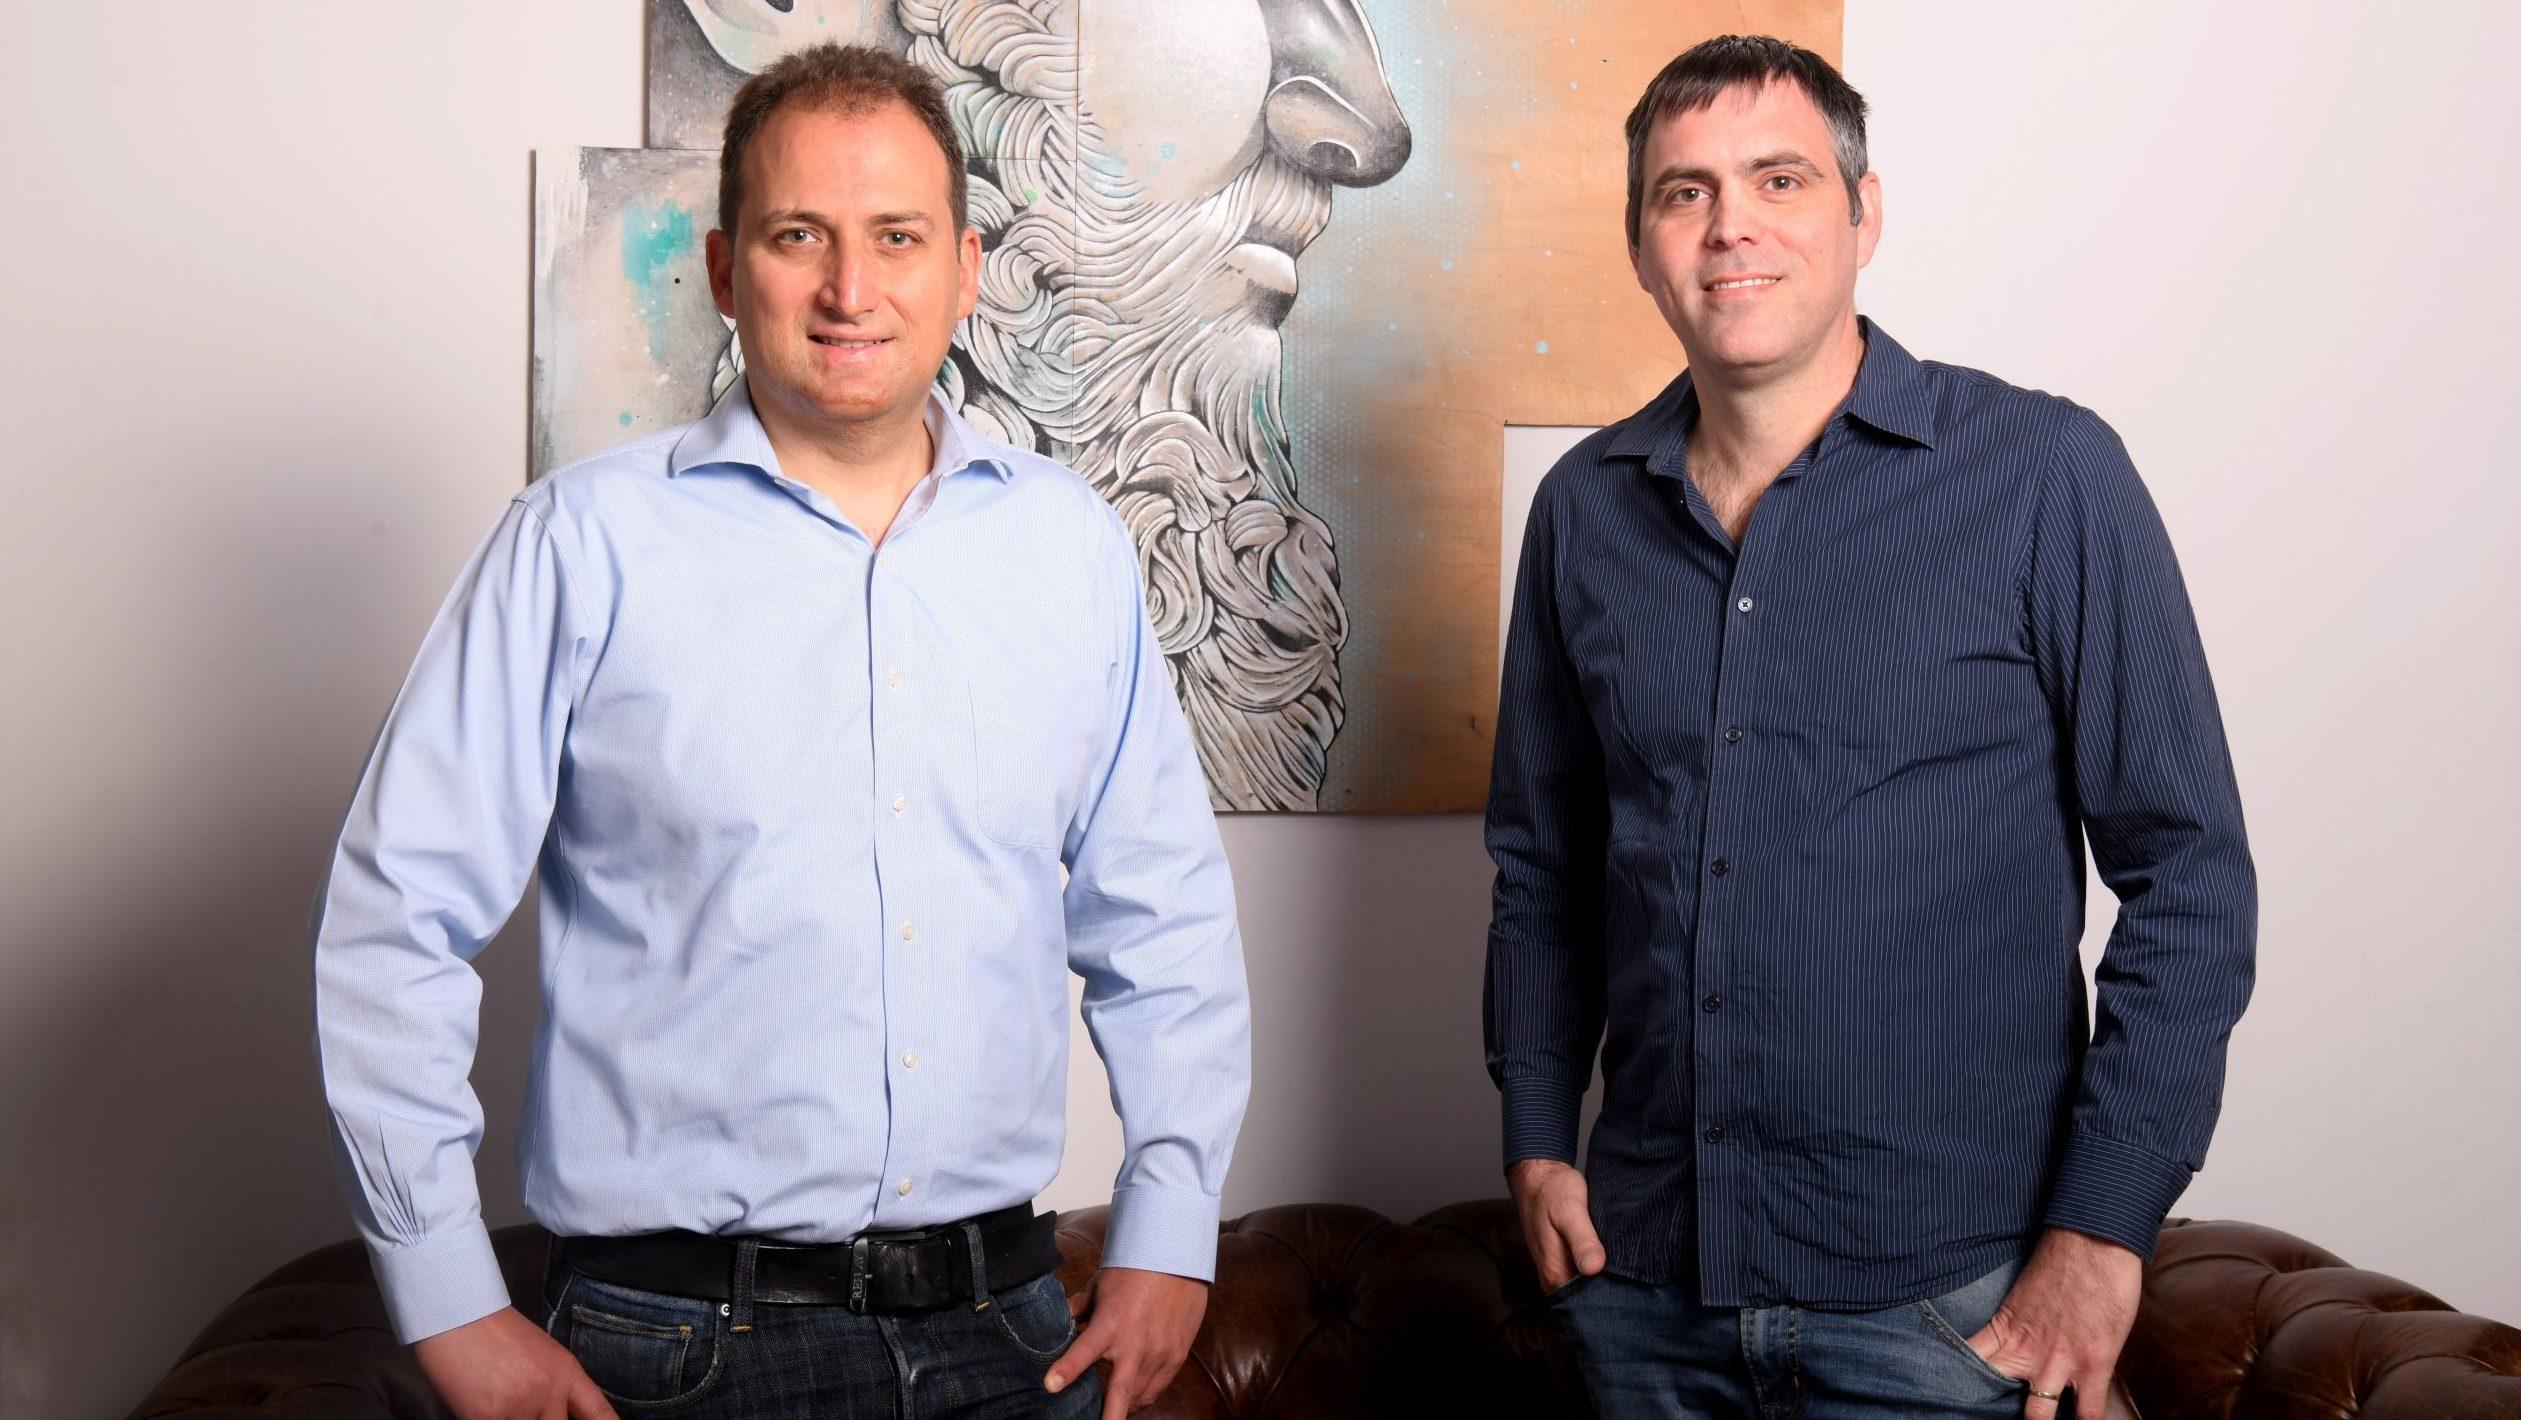 "Honeycomb גייסה 3.3 מיליון דולר בהובלת הפניקס ומשיקה פלטפורמה חדשנית בארה""ב"